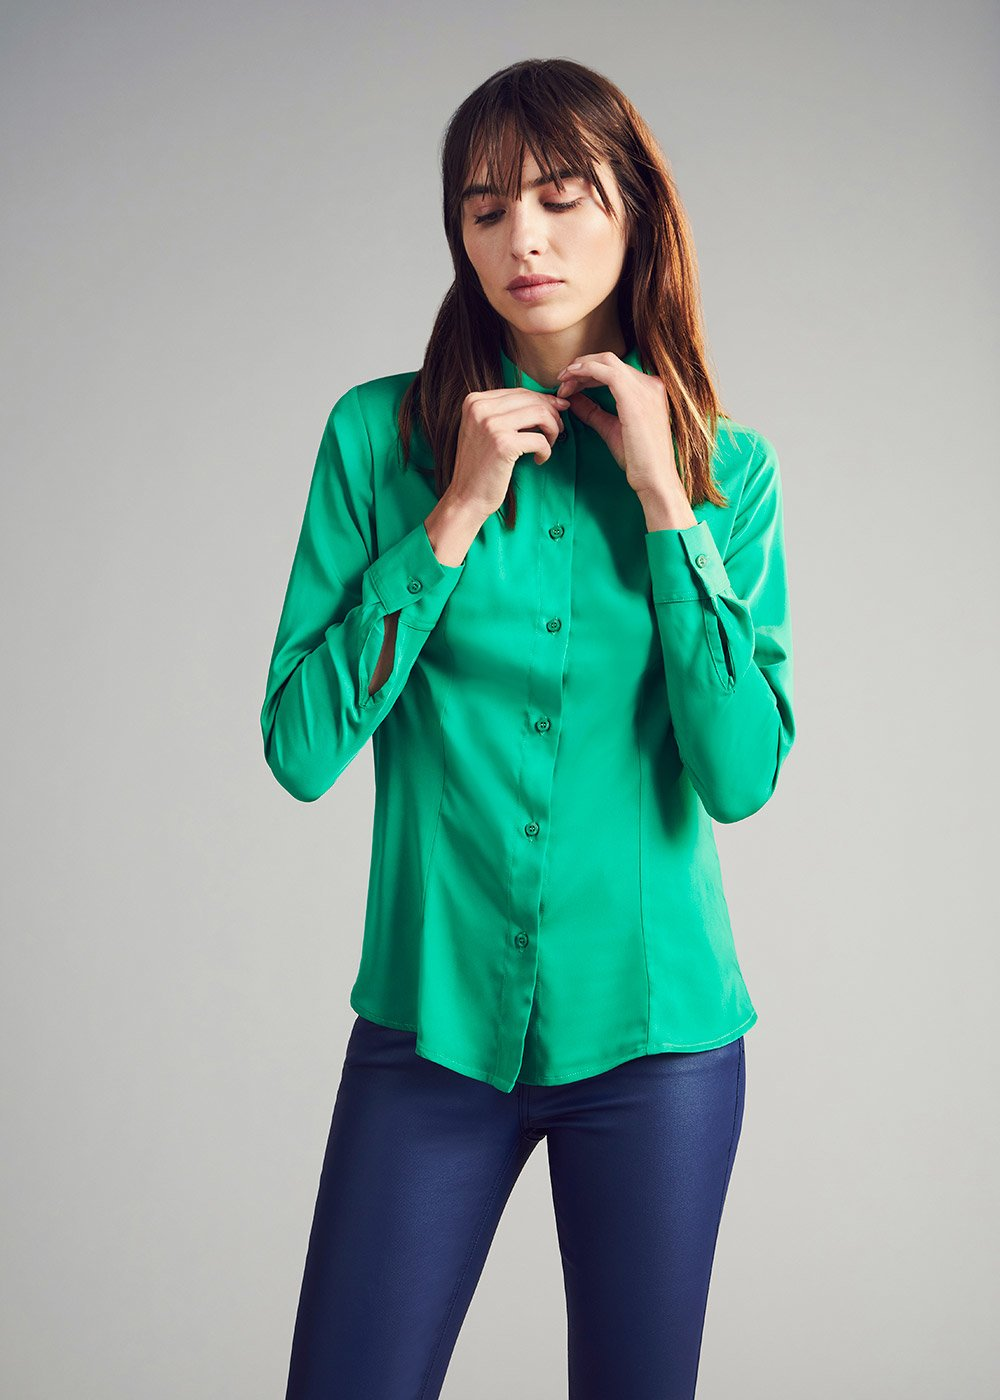 Crizia shirt with satin effect - Green - Woman